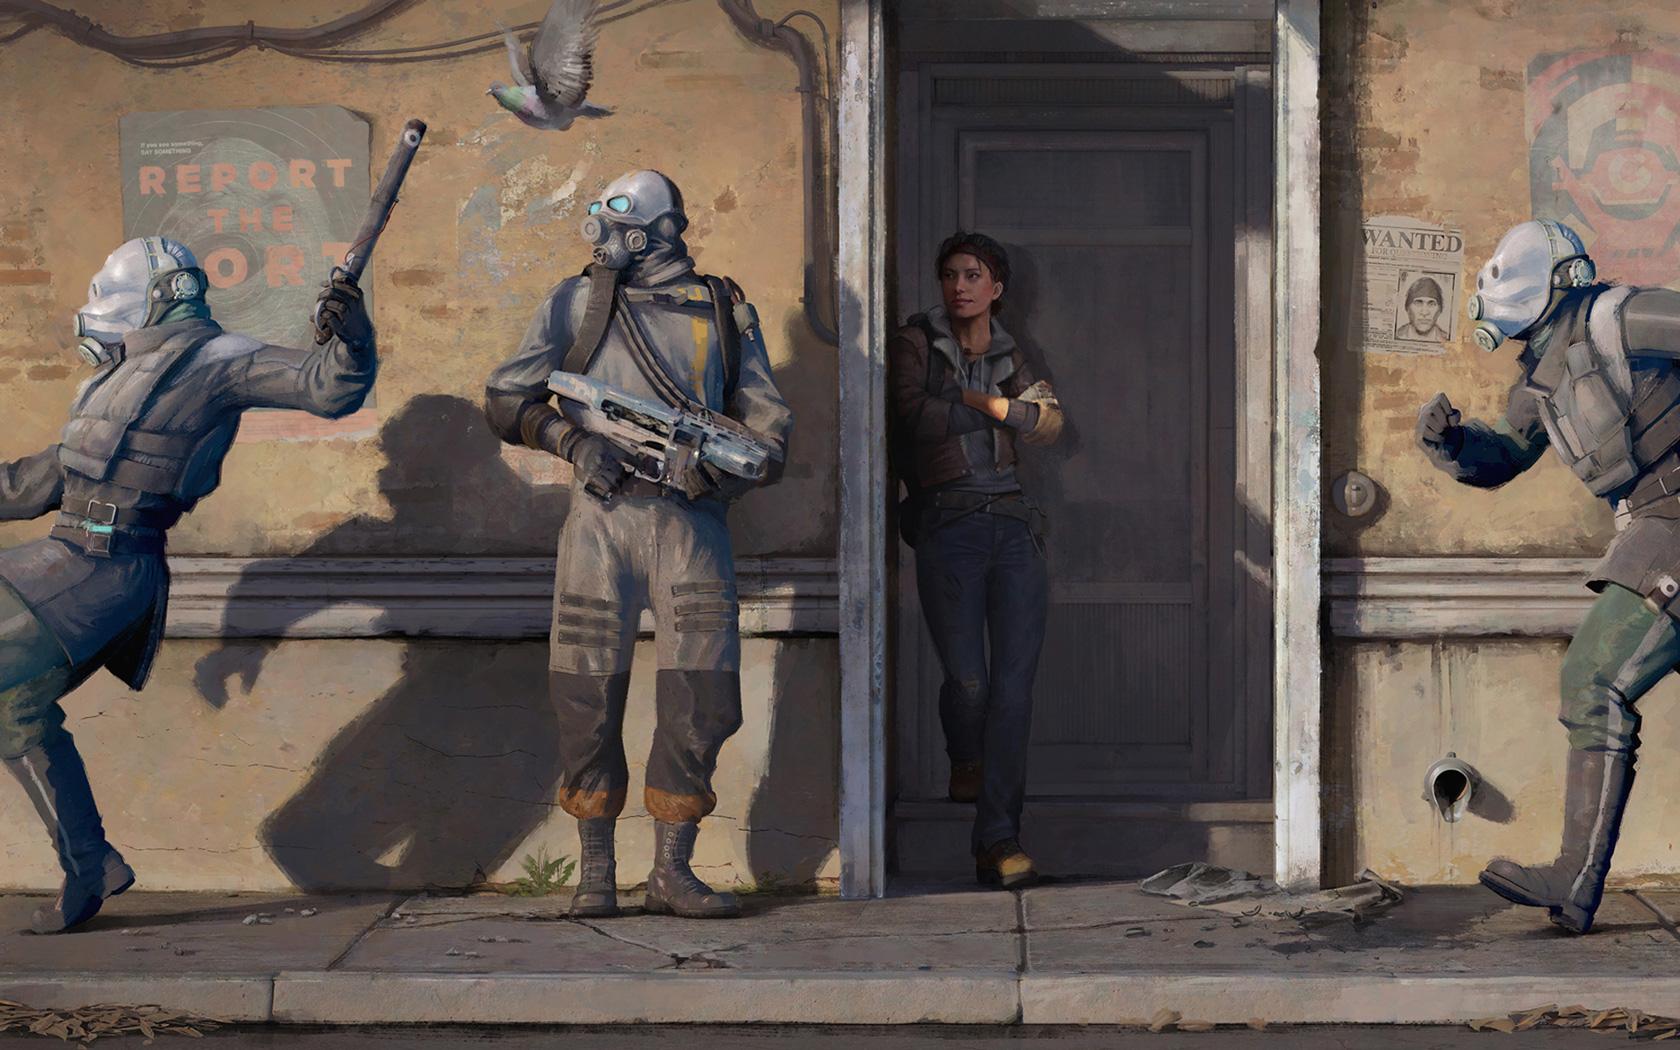 Free Half-Life: Alyx Wallpaper in 1680x1050